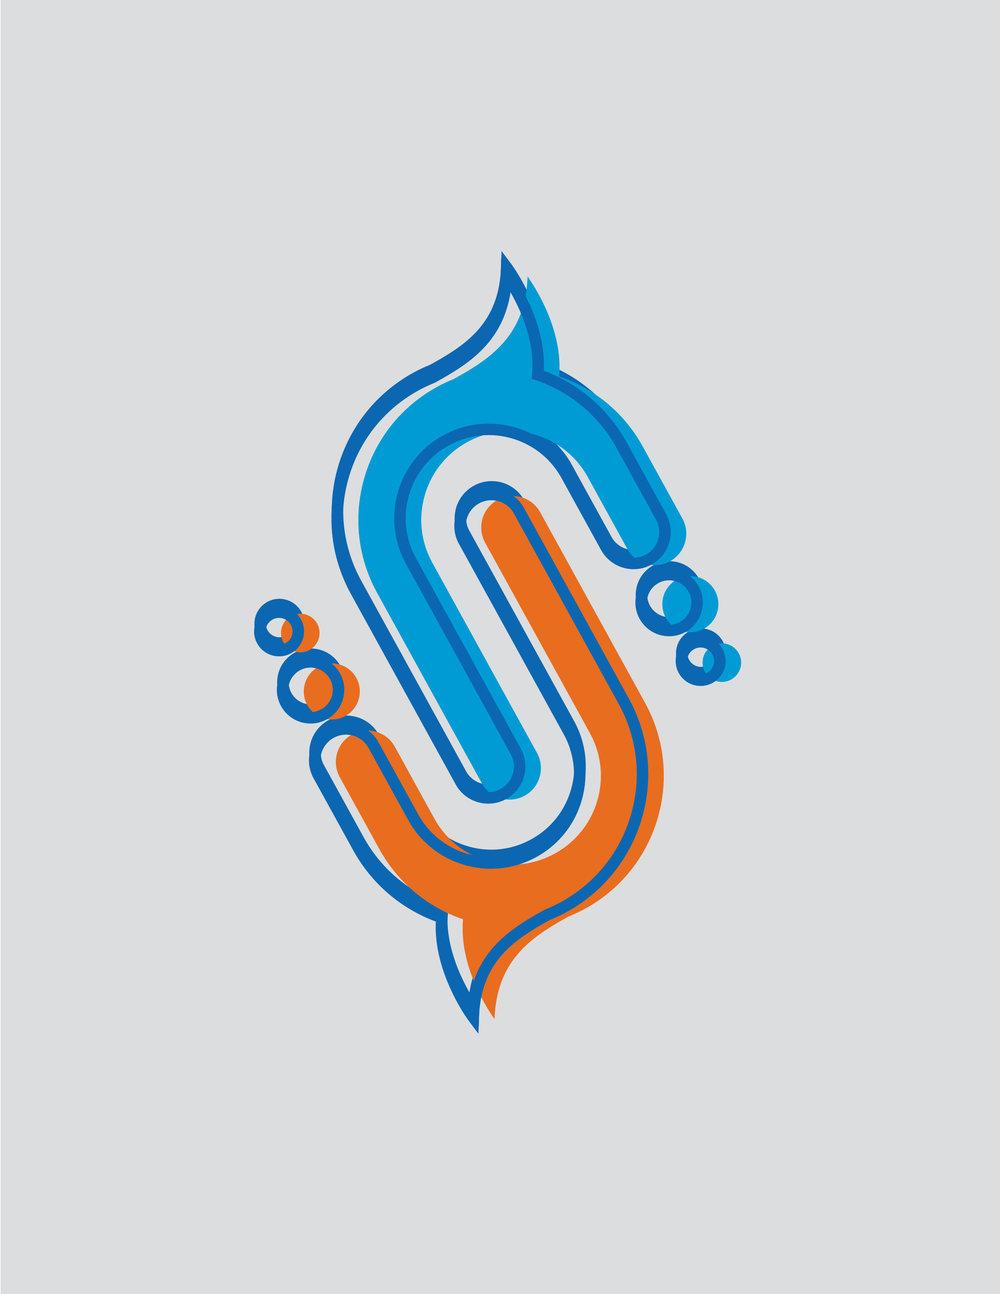 Student Senate Logo_Images-11.jpg